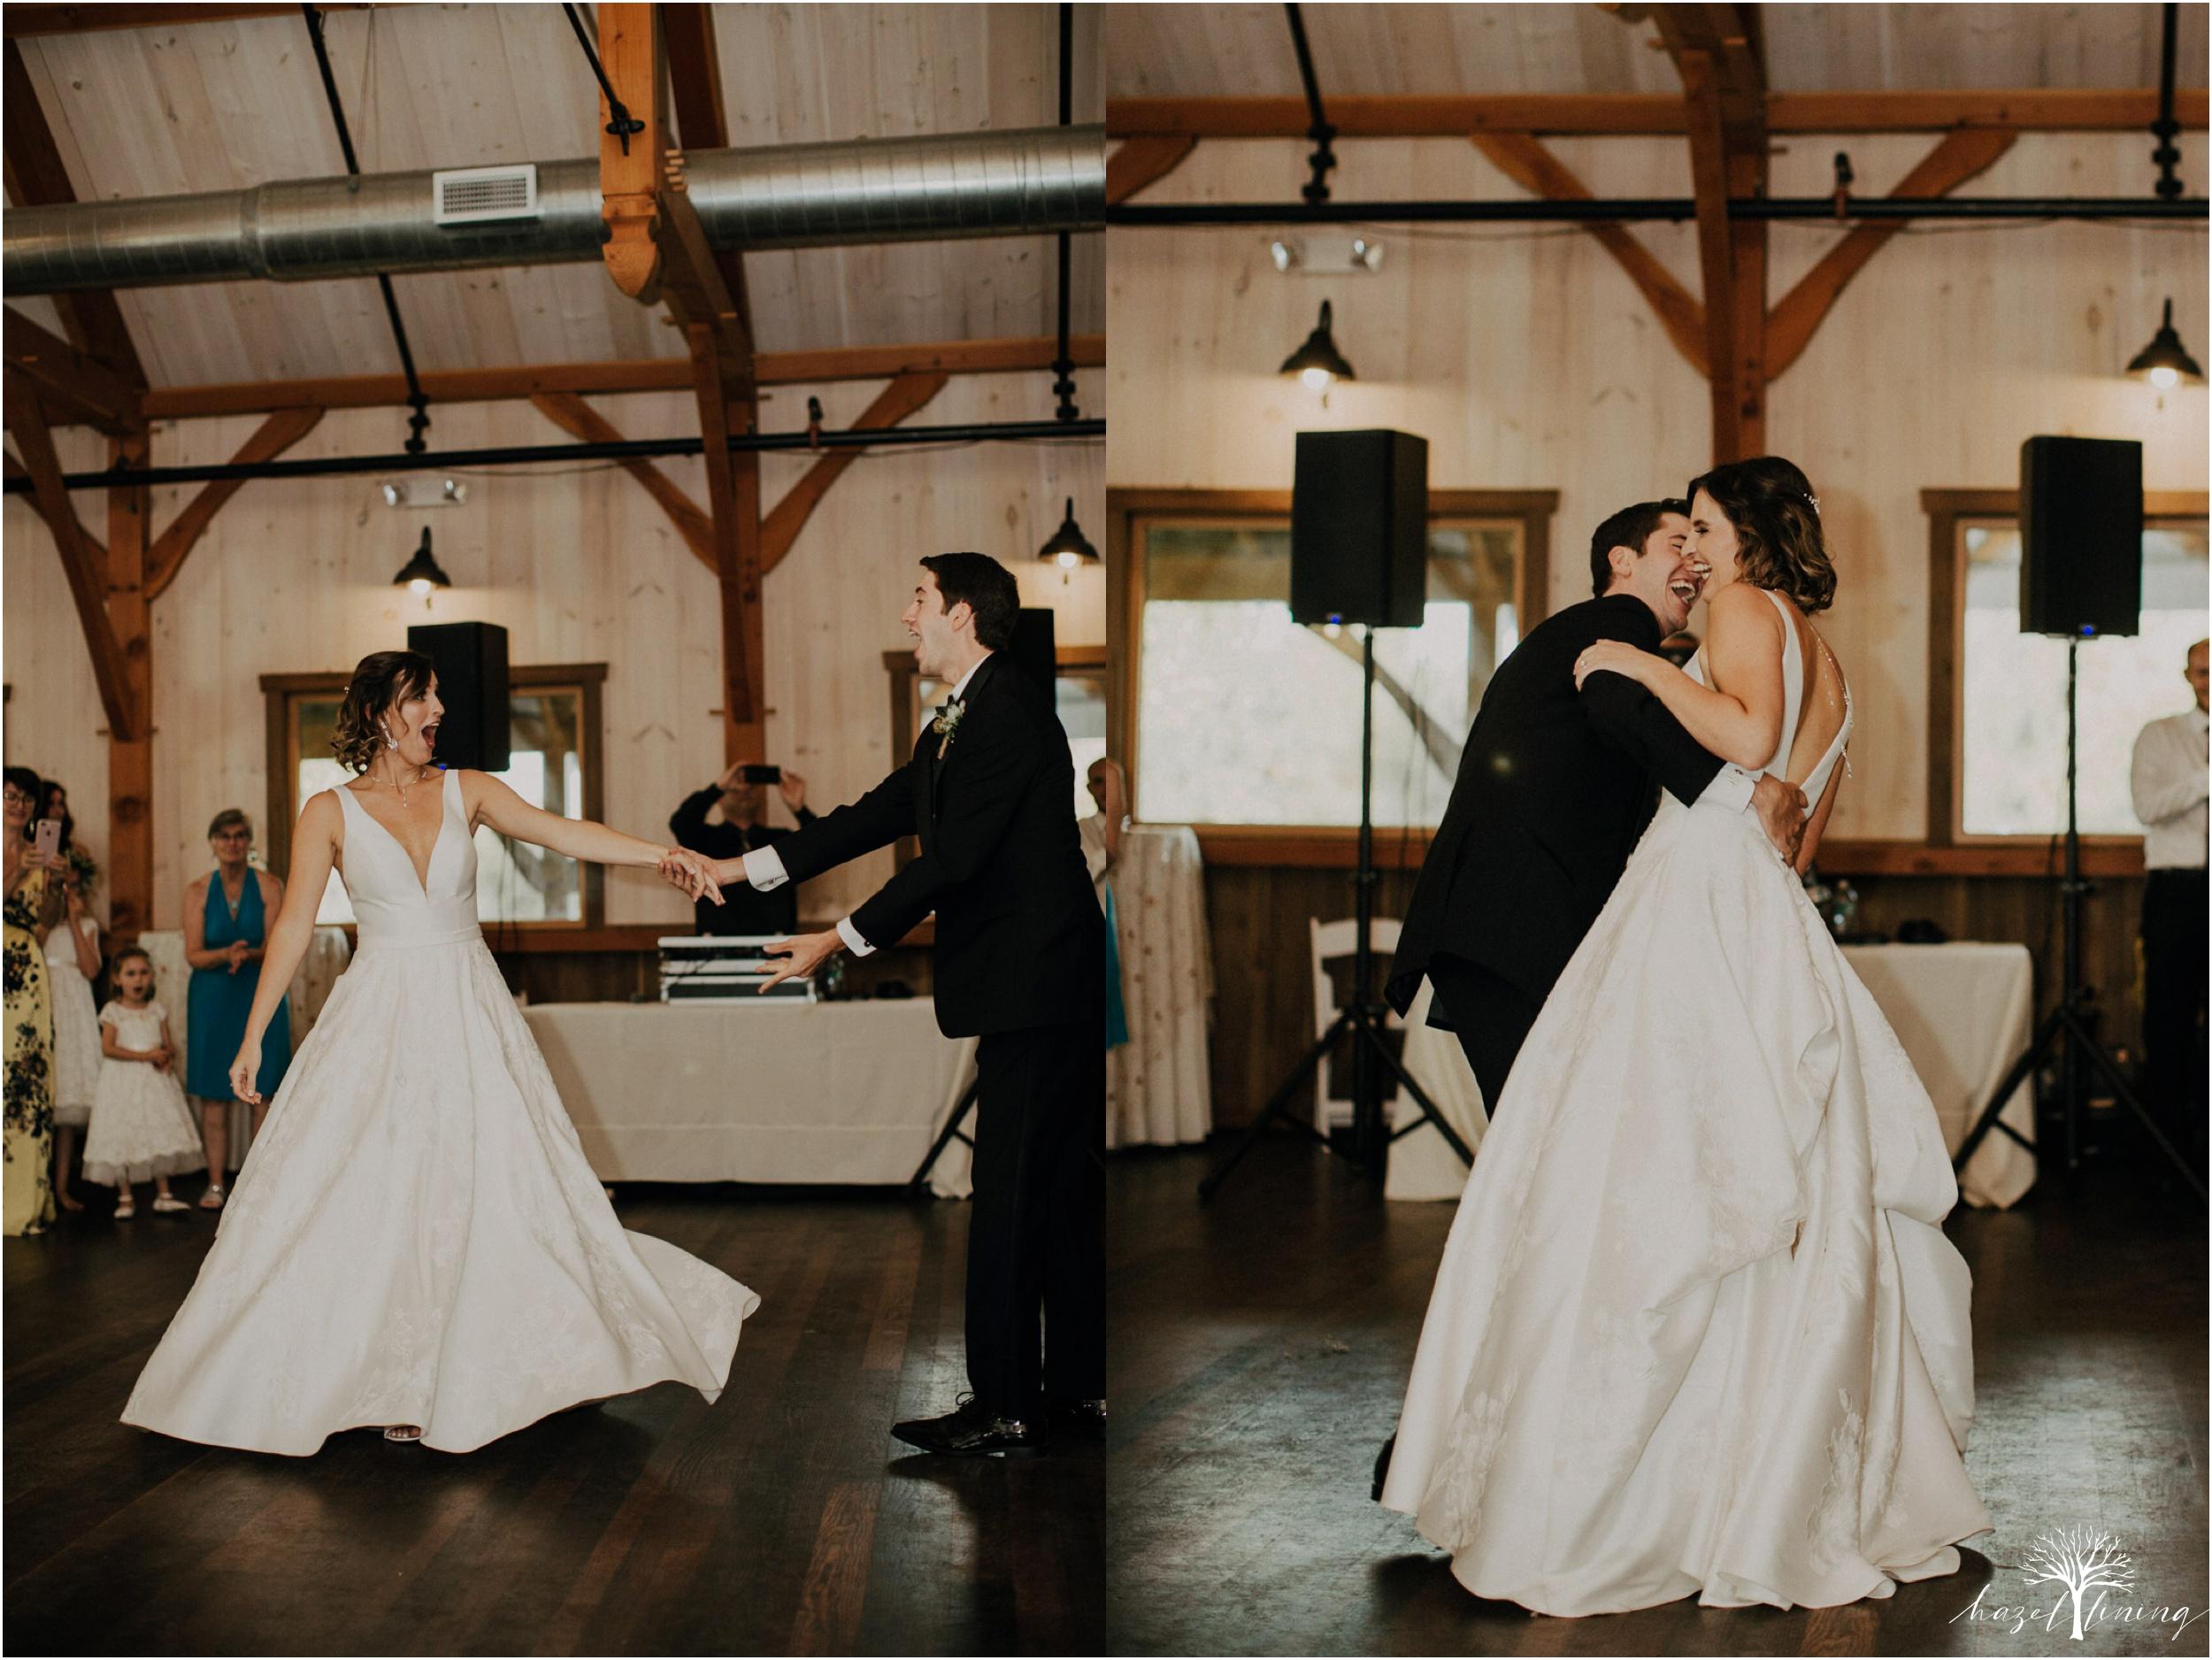 maureen-hepner-anthony-giordano-rose-bank-winery-newtow-pennsylvania-luxury-summer-wedding-hazel-lining-photography-destination-elopement-wedding-engagement-photography_0136.jpg